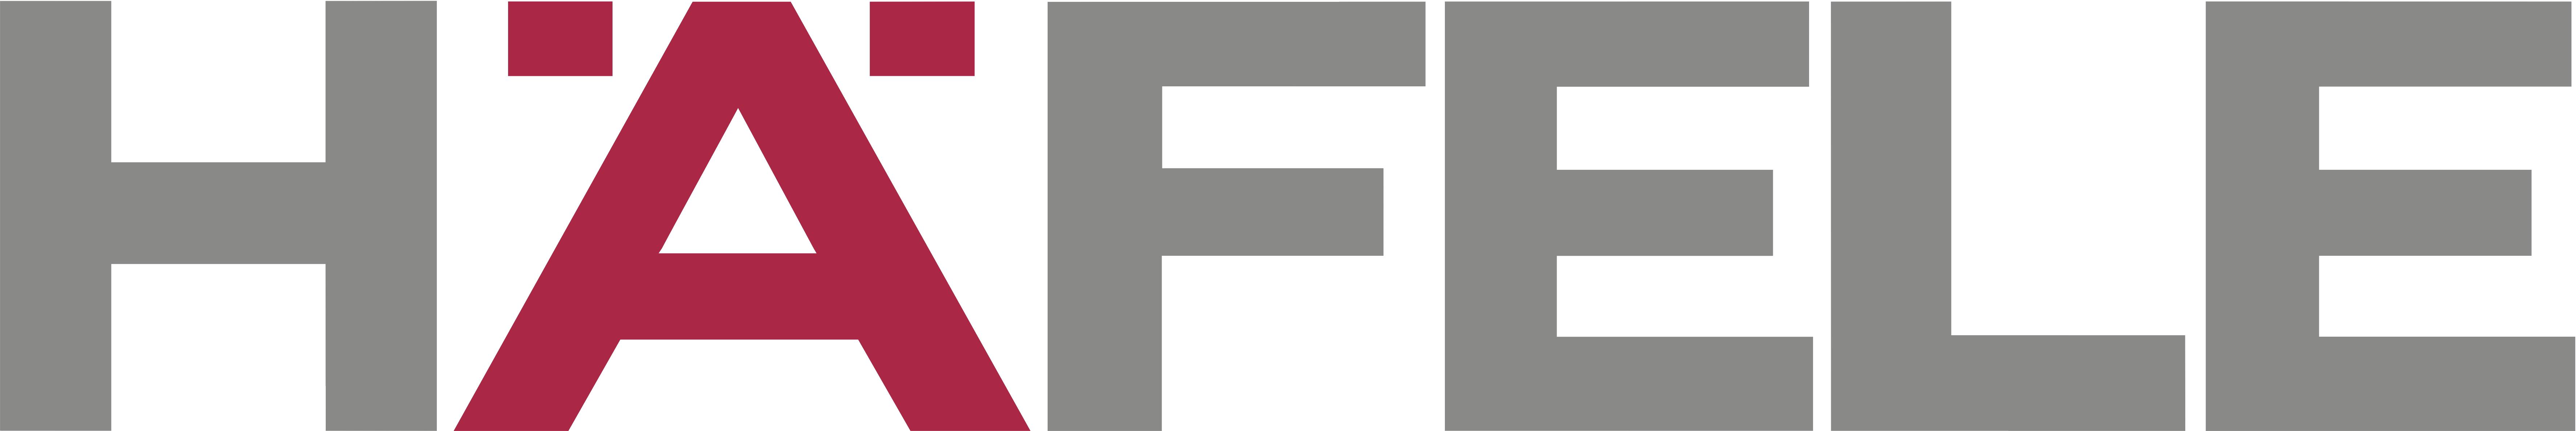 Hafele-1020×573